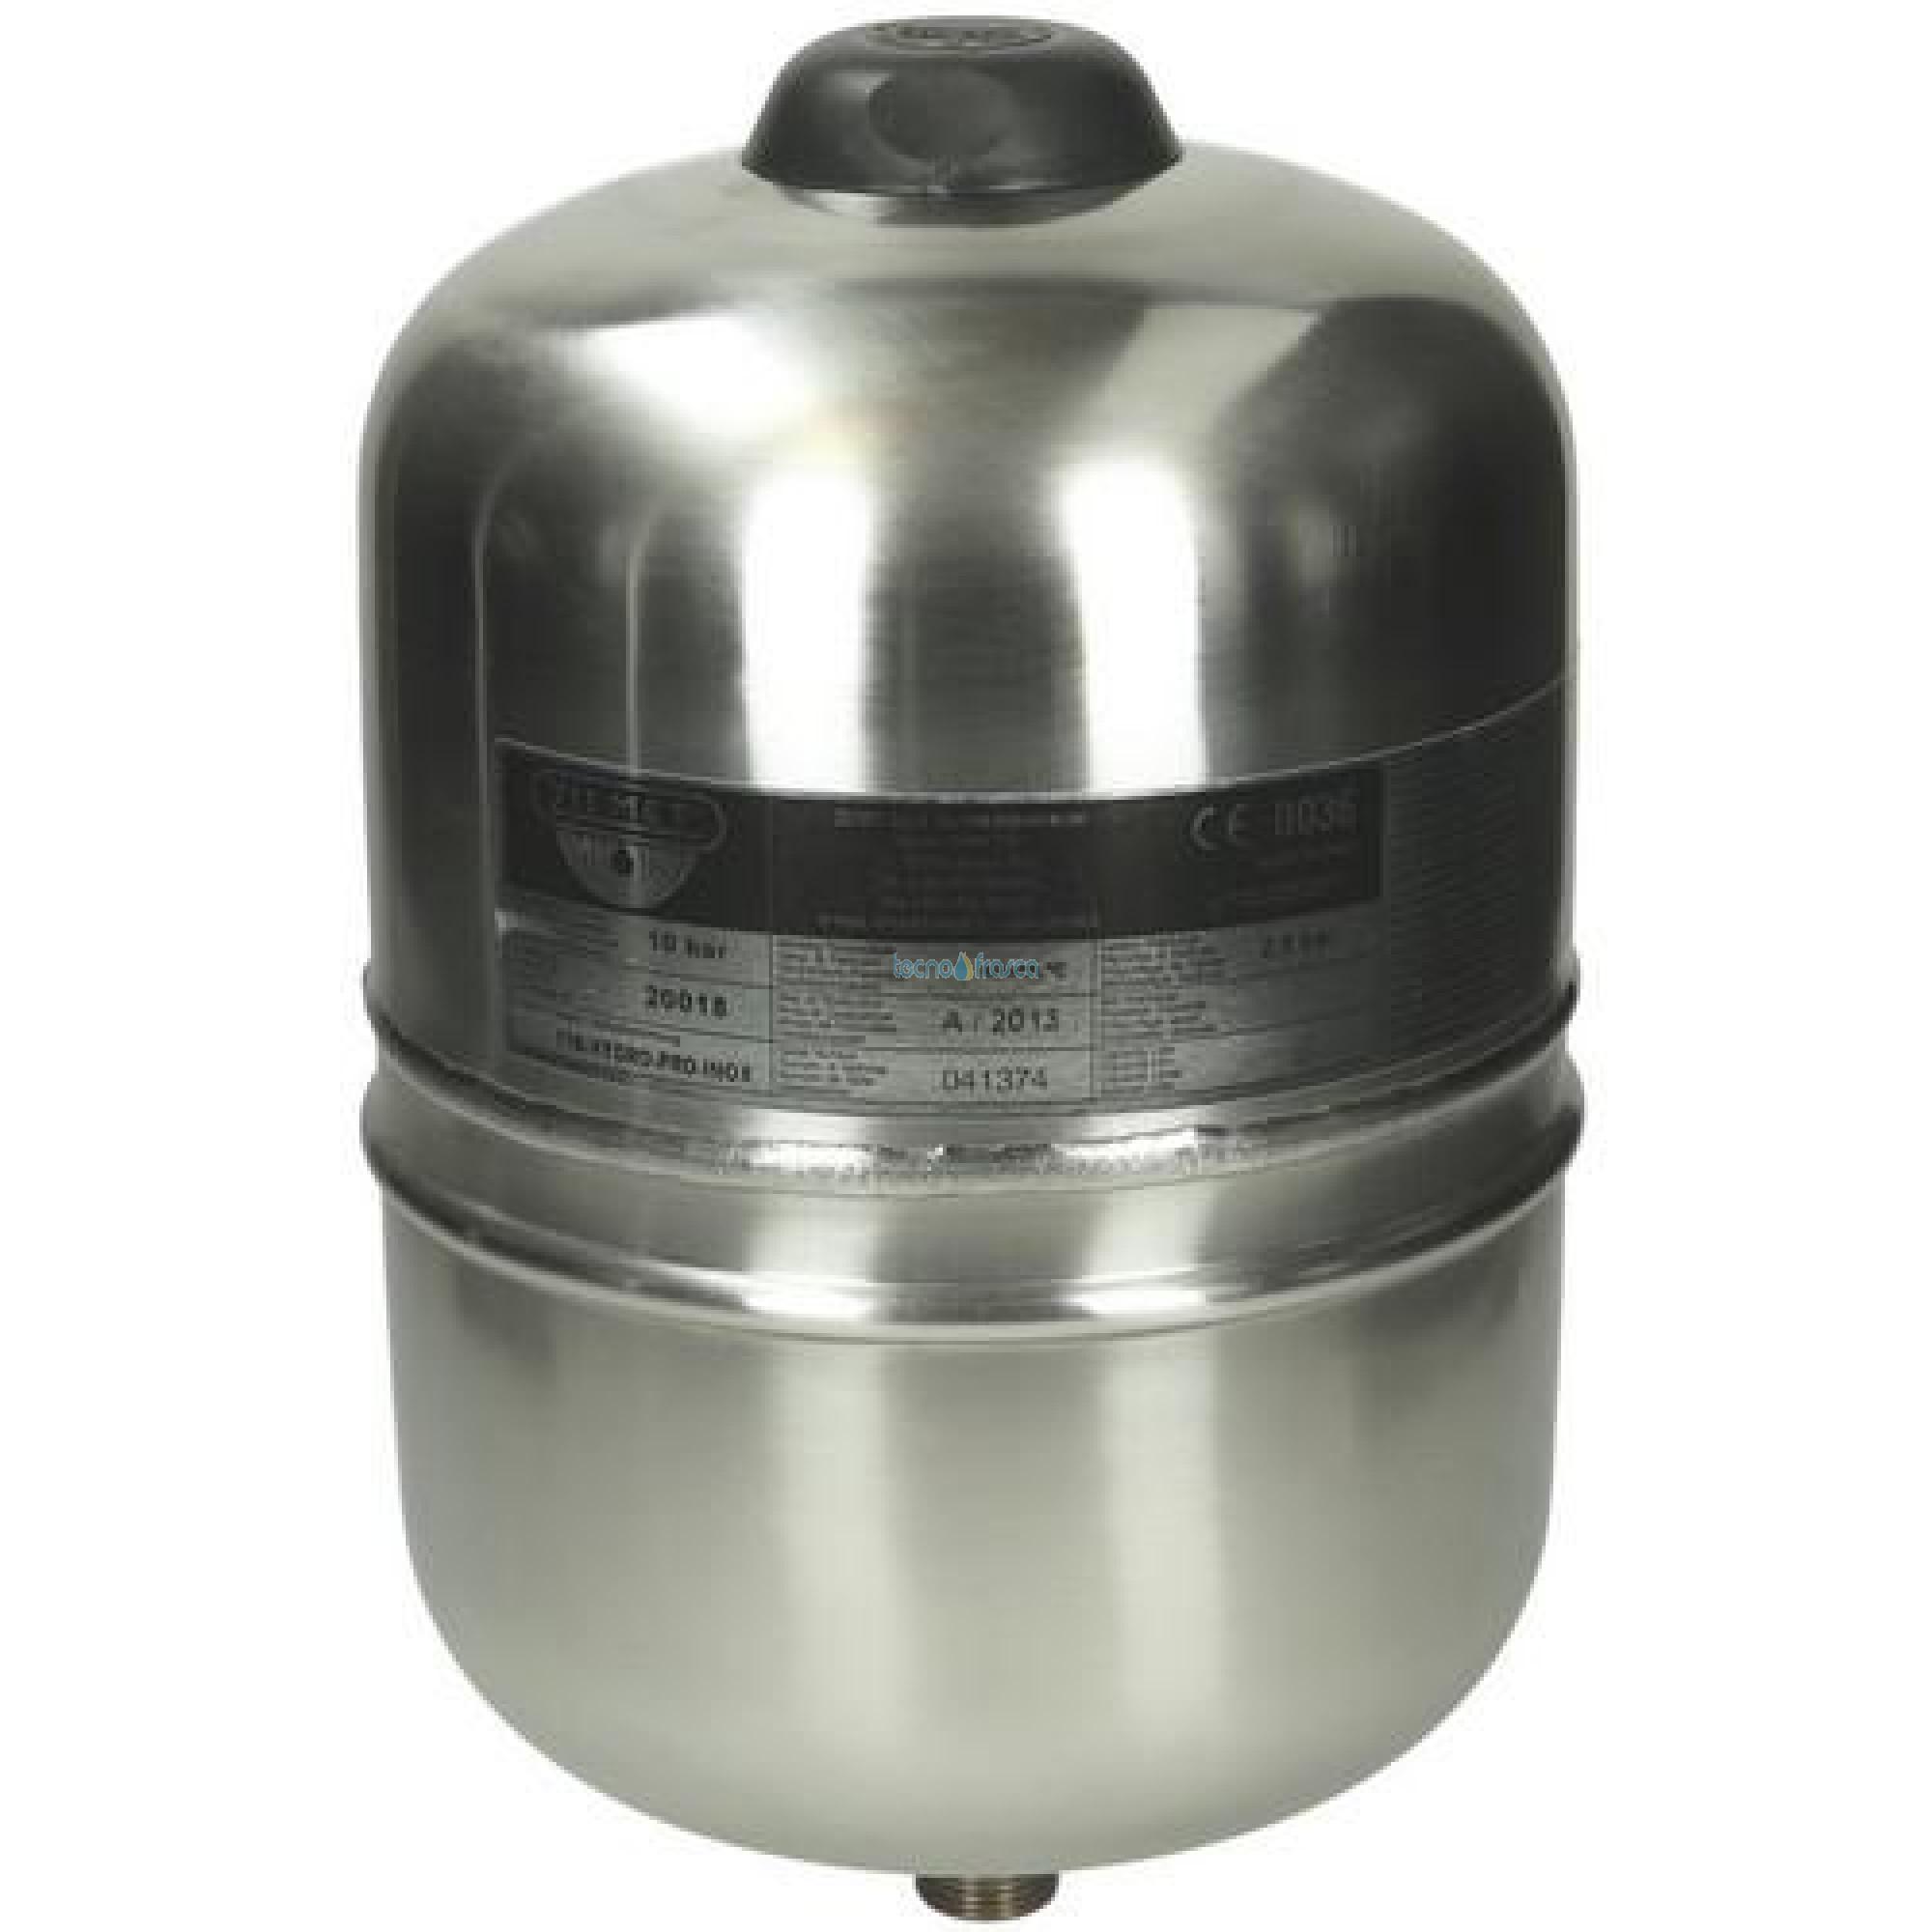 Hermann vaso di espansione lt2 h160620002